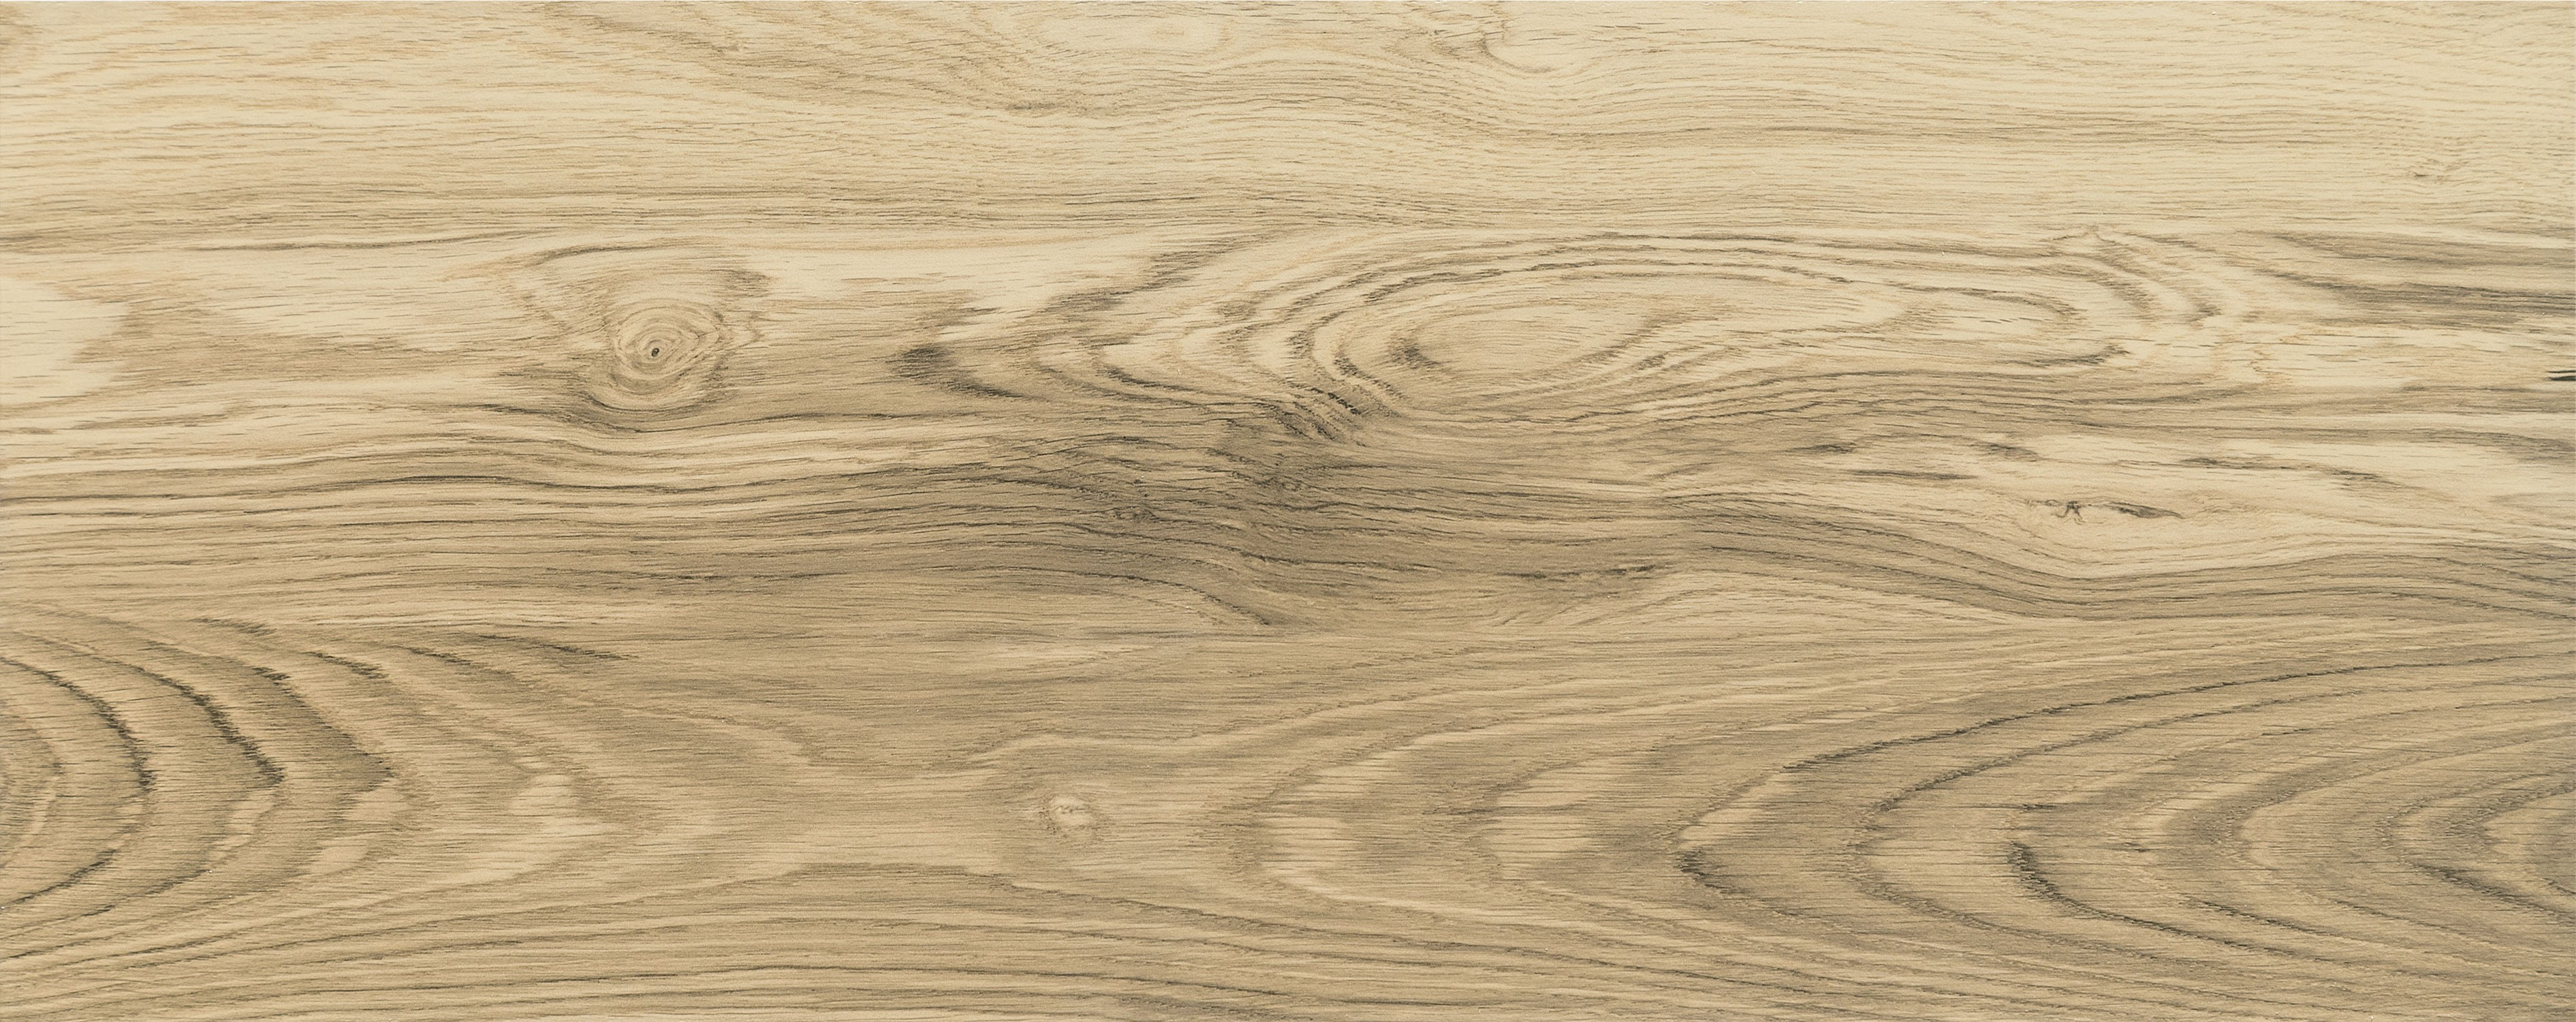 Royal Place wood - obkládačka rektifikovaná 29,8x74,8 hnědá